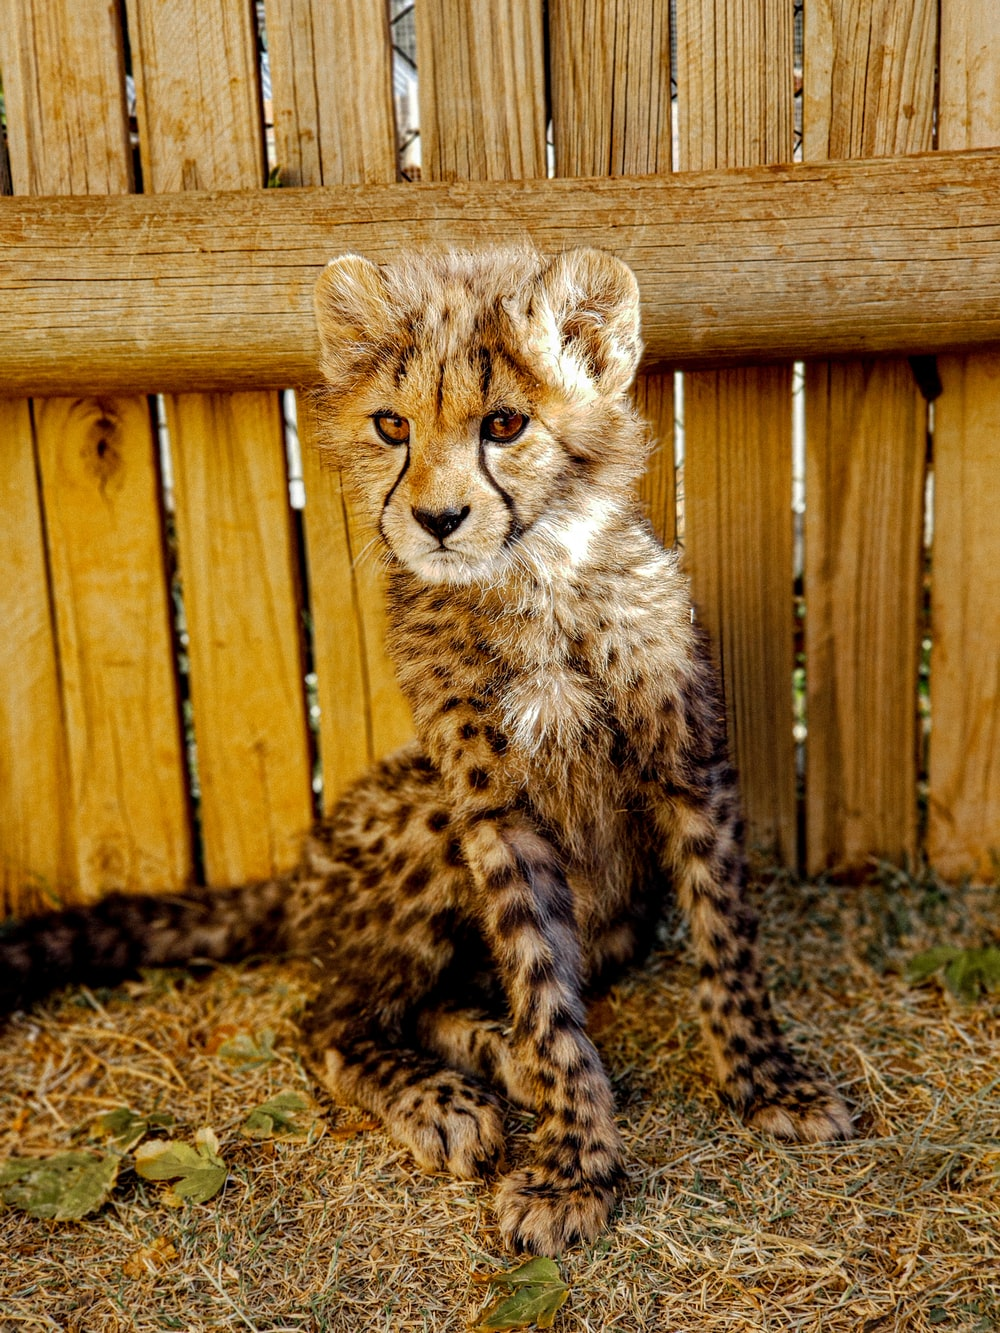 cheetah sitting on brown wooden bench